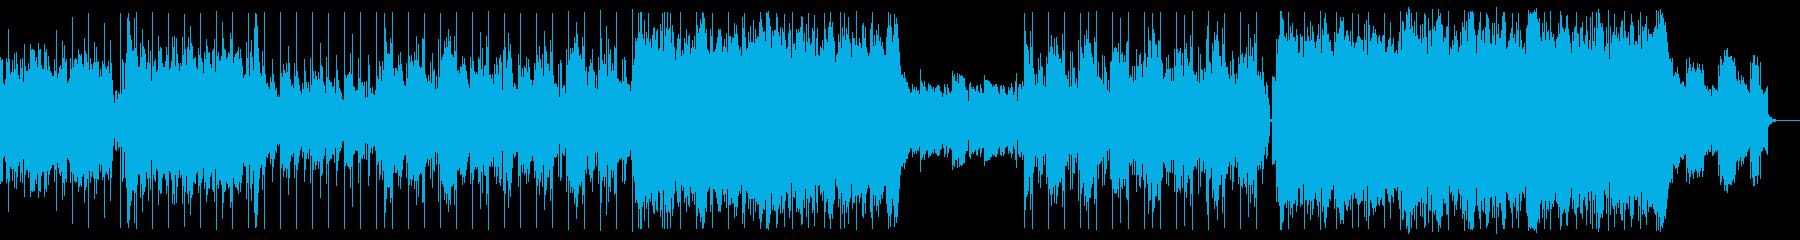 EDMなサウンドが印象的なアップテンポの再生済みの波形